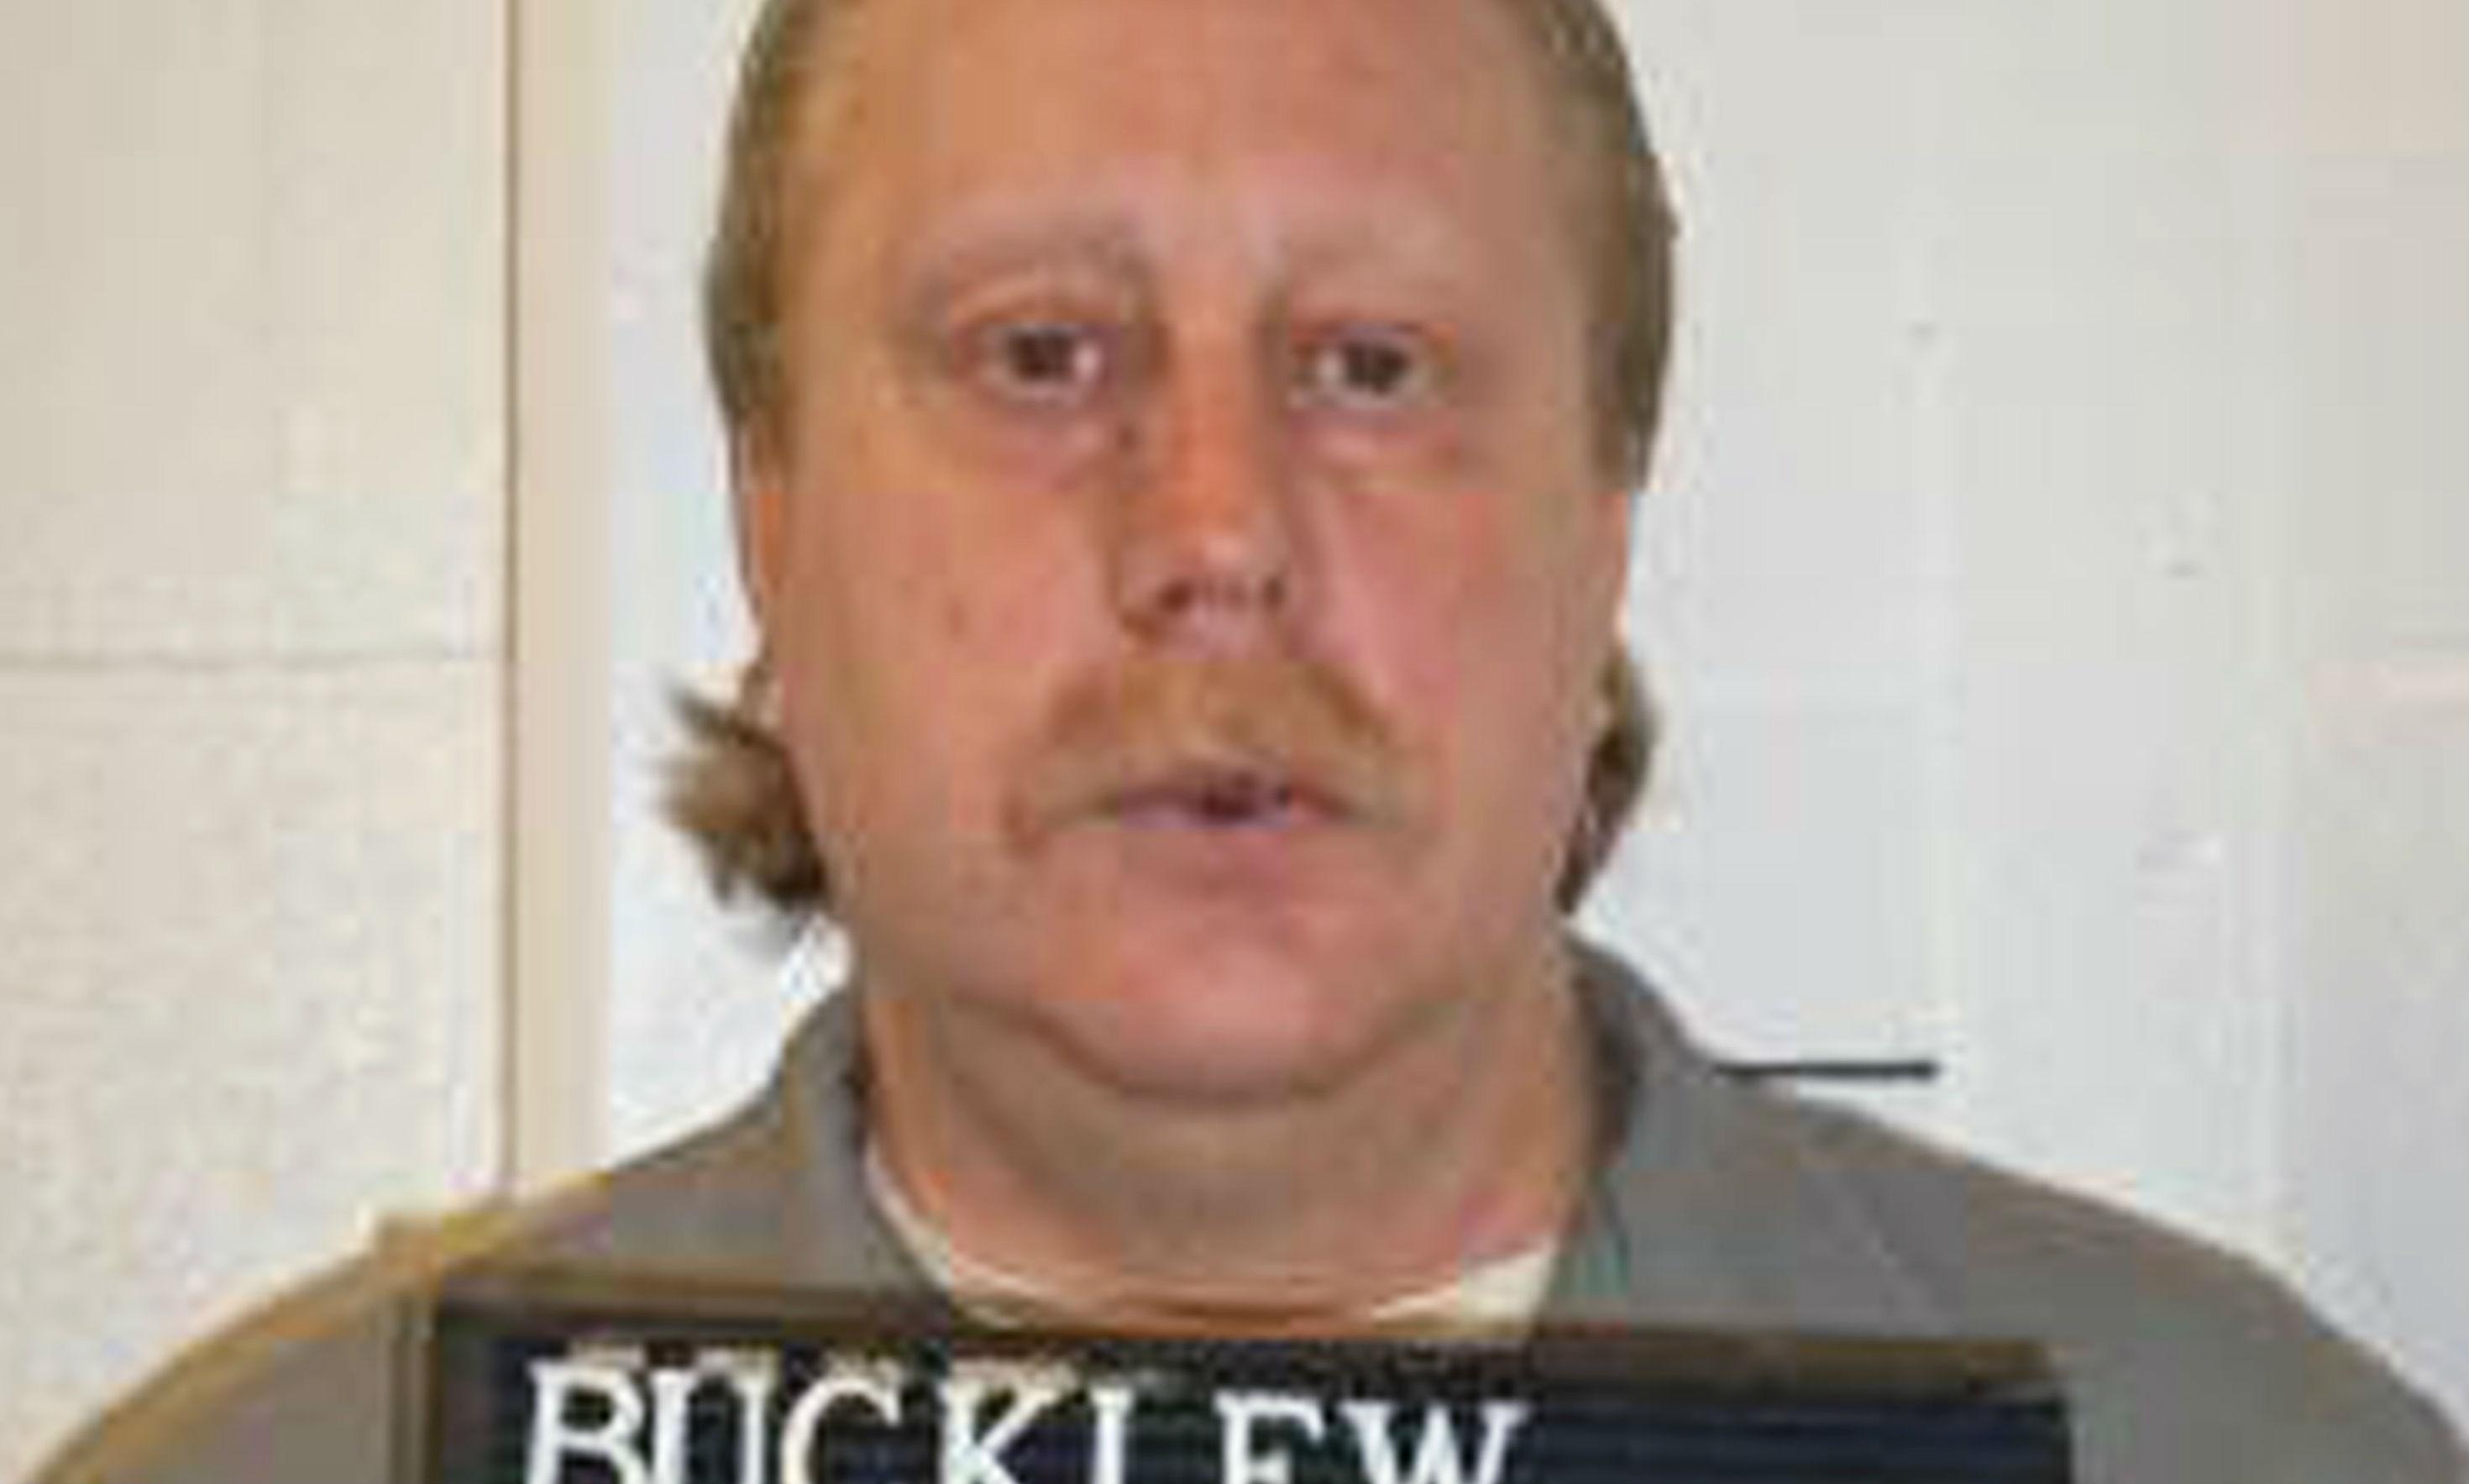 pemRussell-Bucklew-AP-Photo-Missouri-Department-of-Correctionsemp